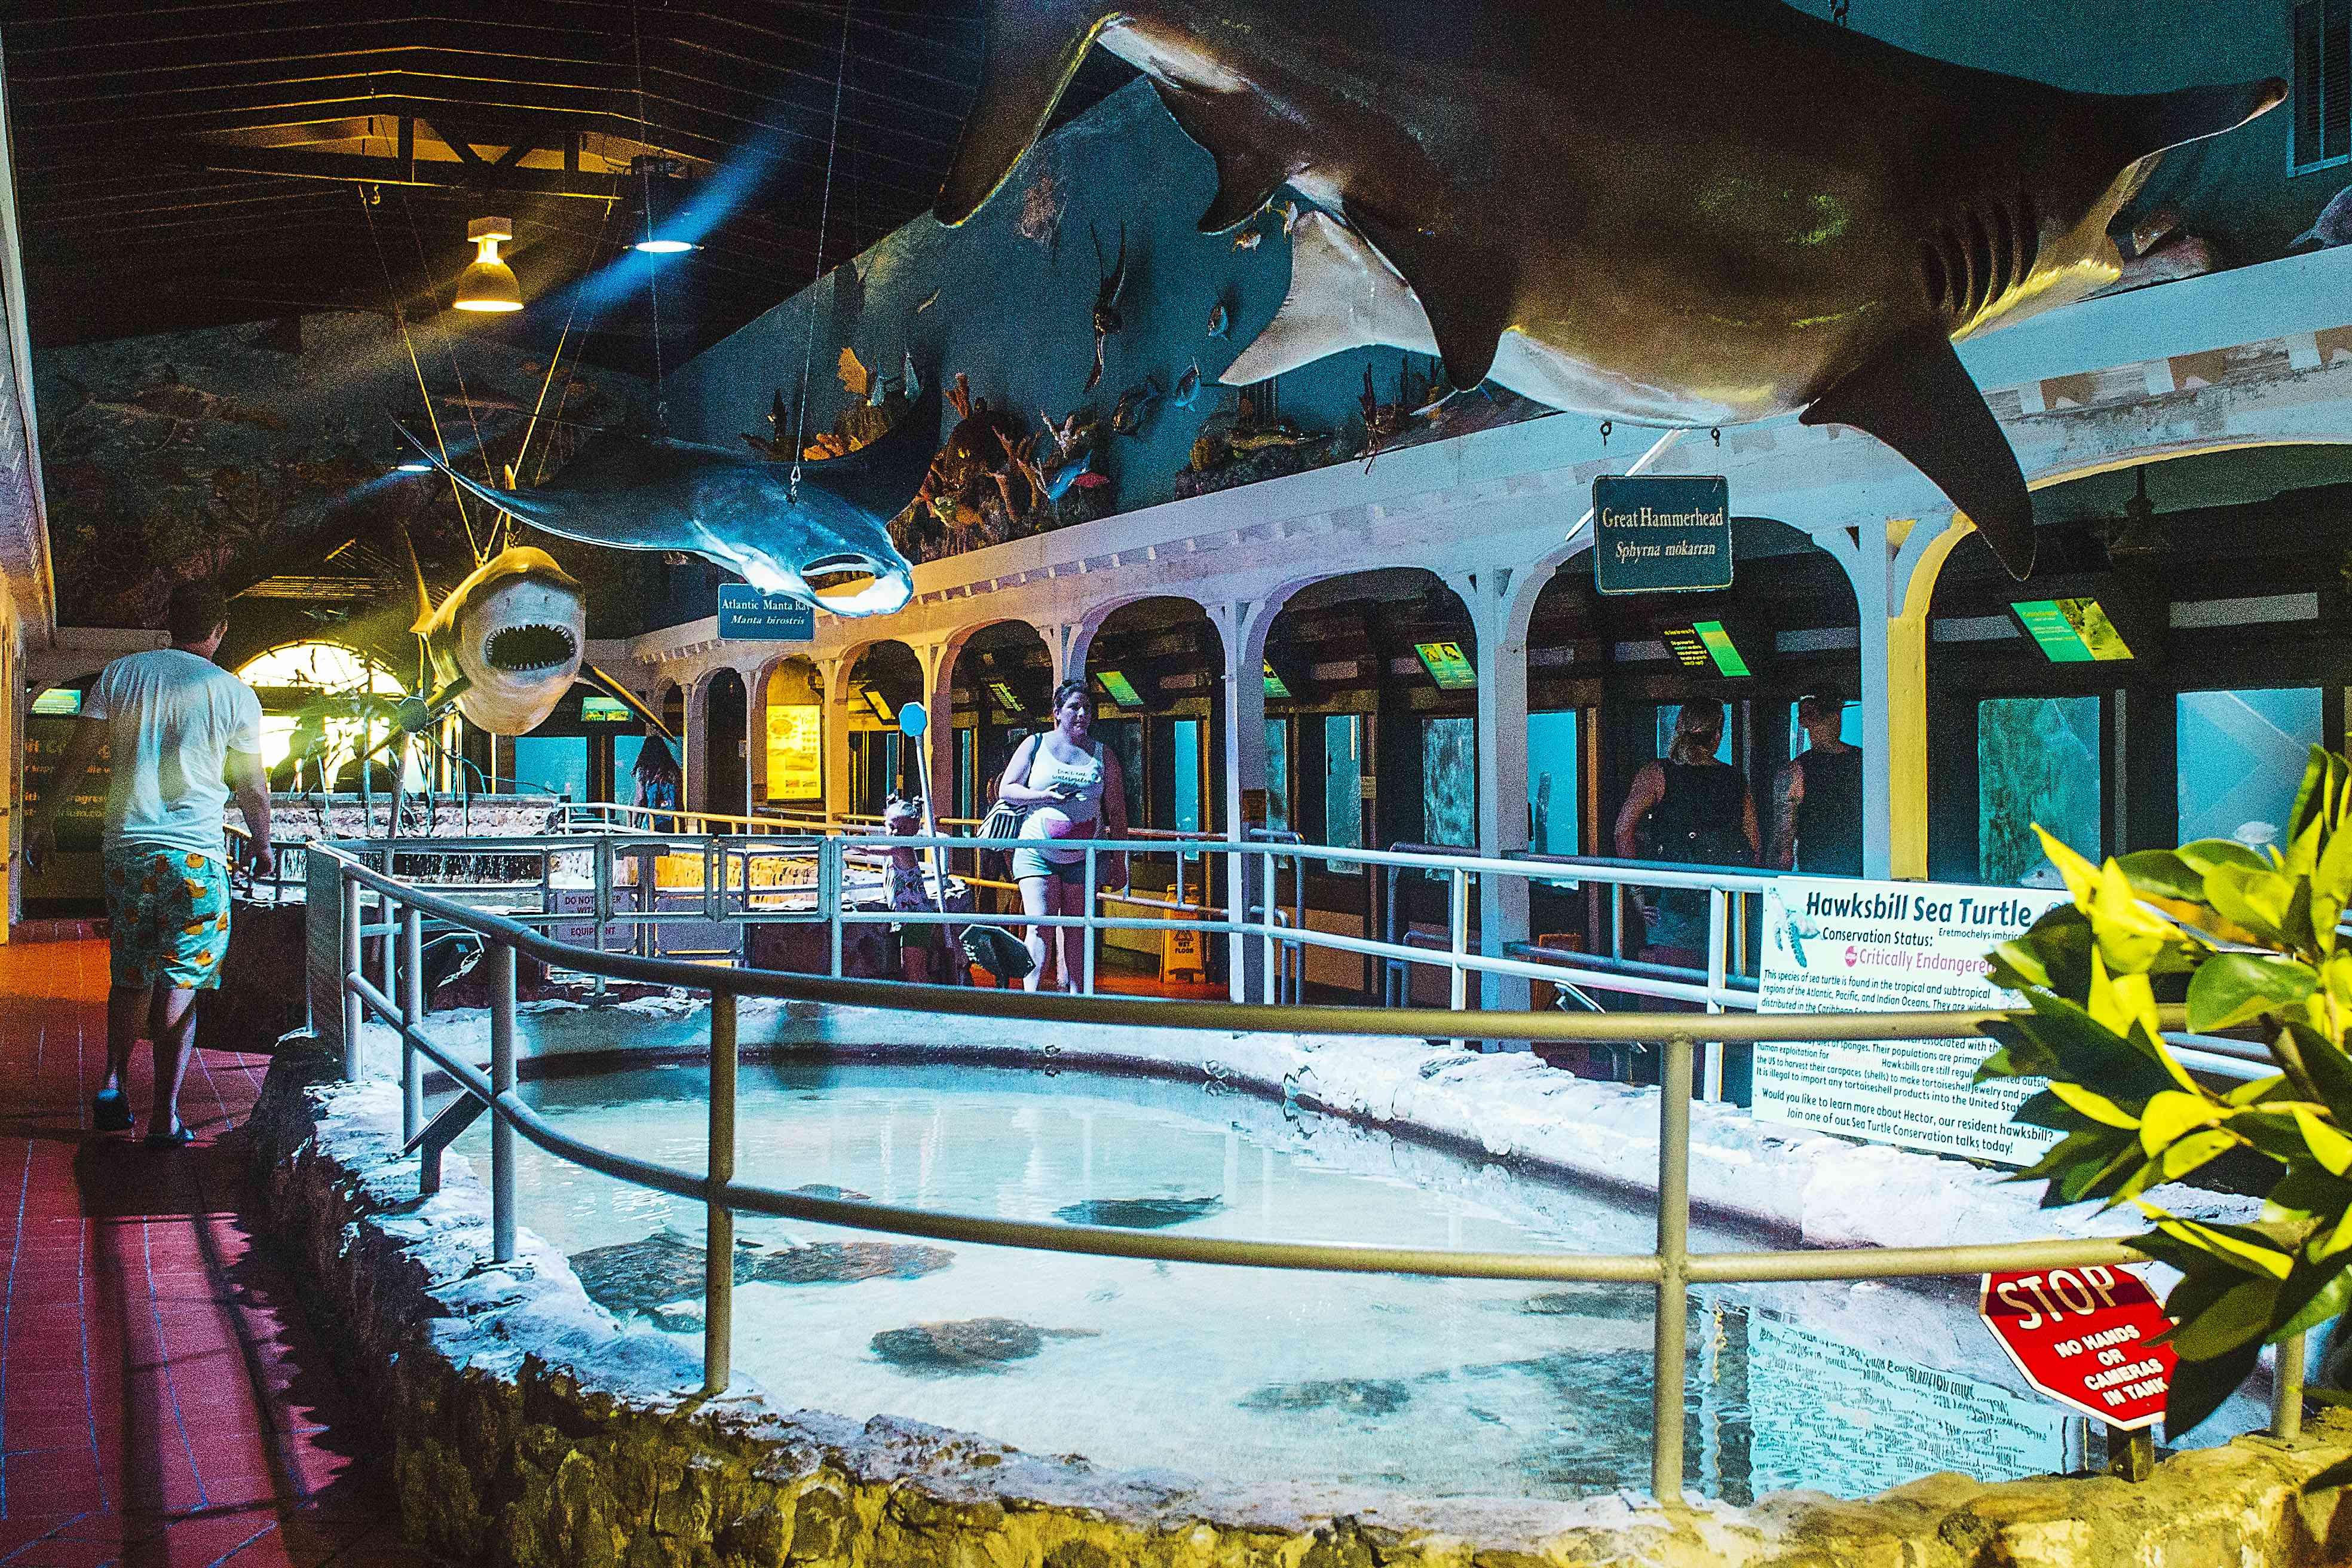 Inside the Key West Aquarium